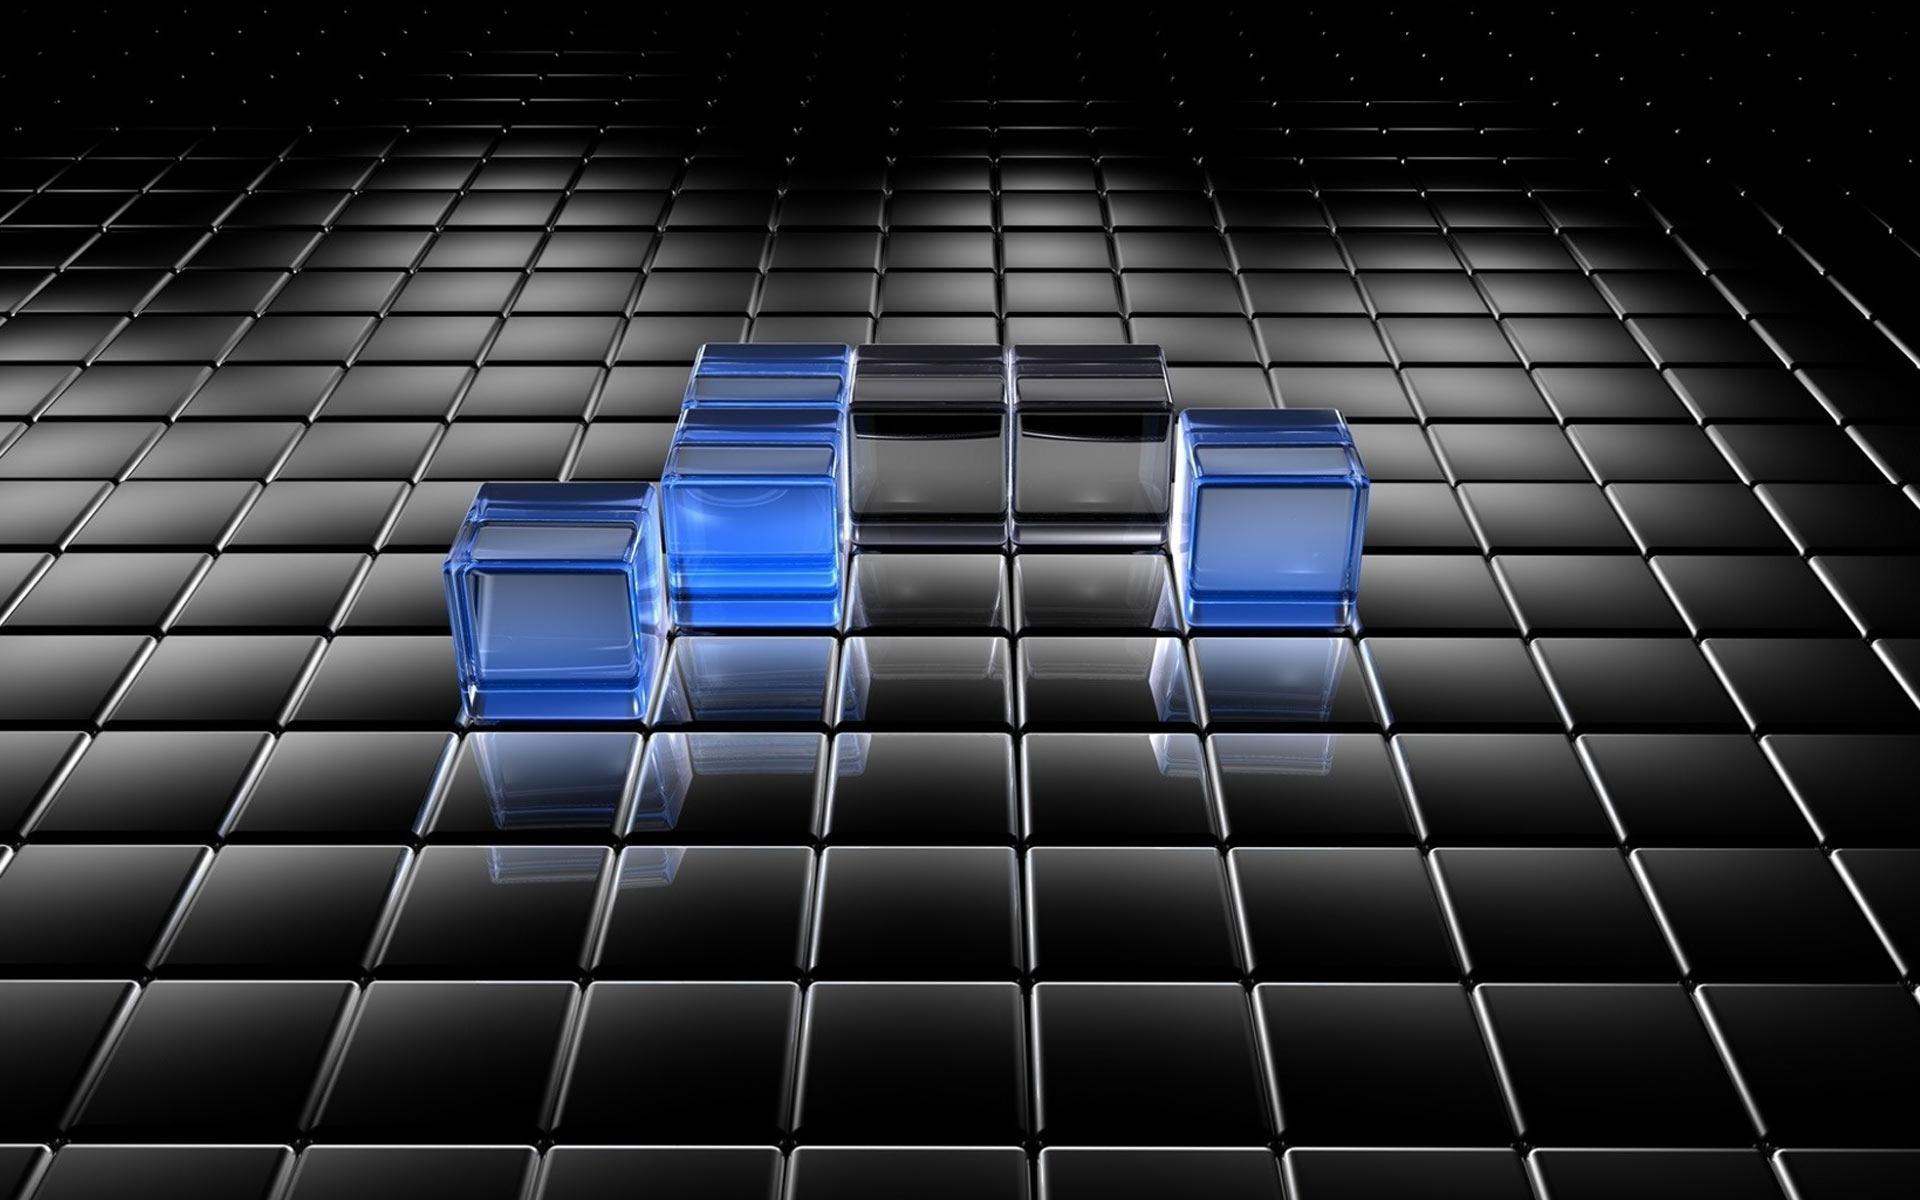 Black and blue translucent cubes wallpaper 118 1920x1200